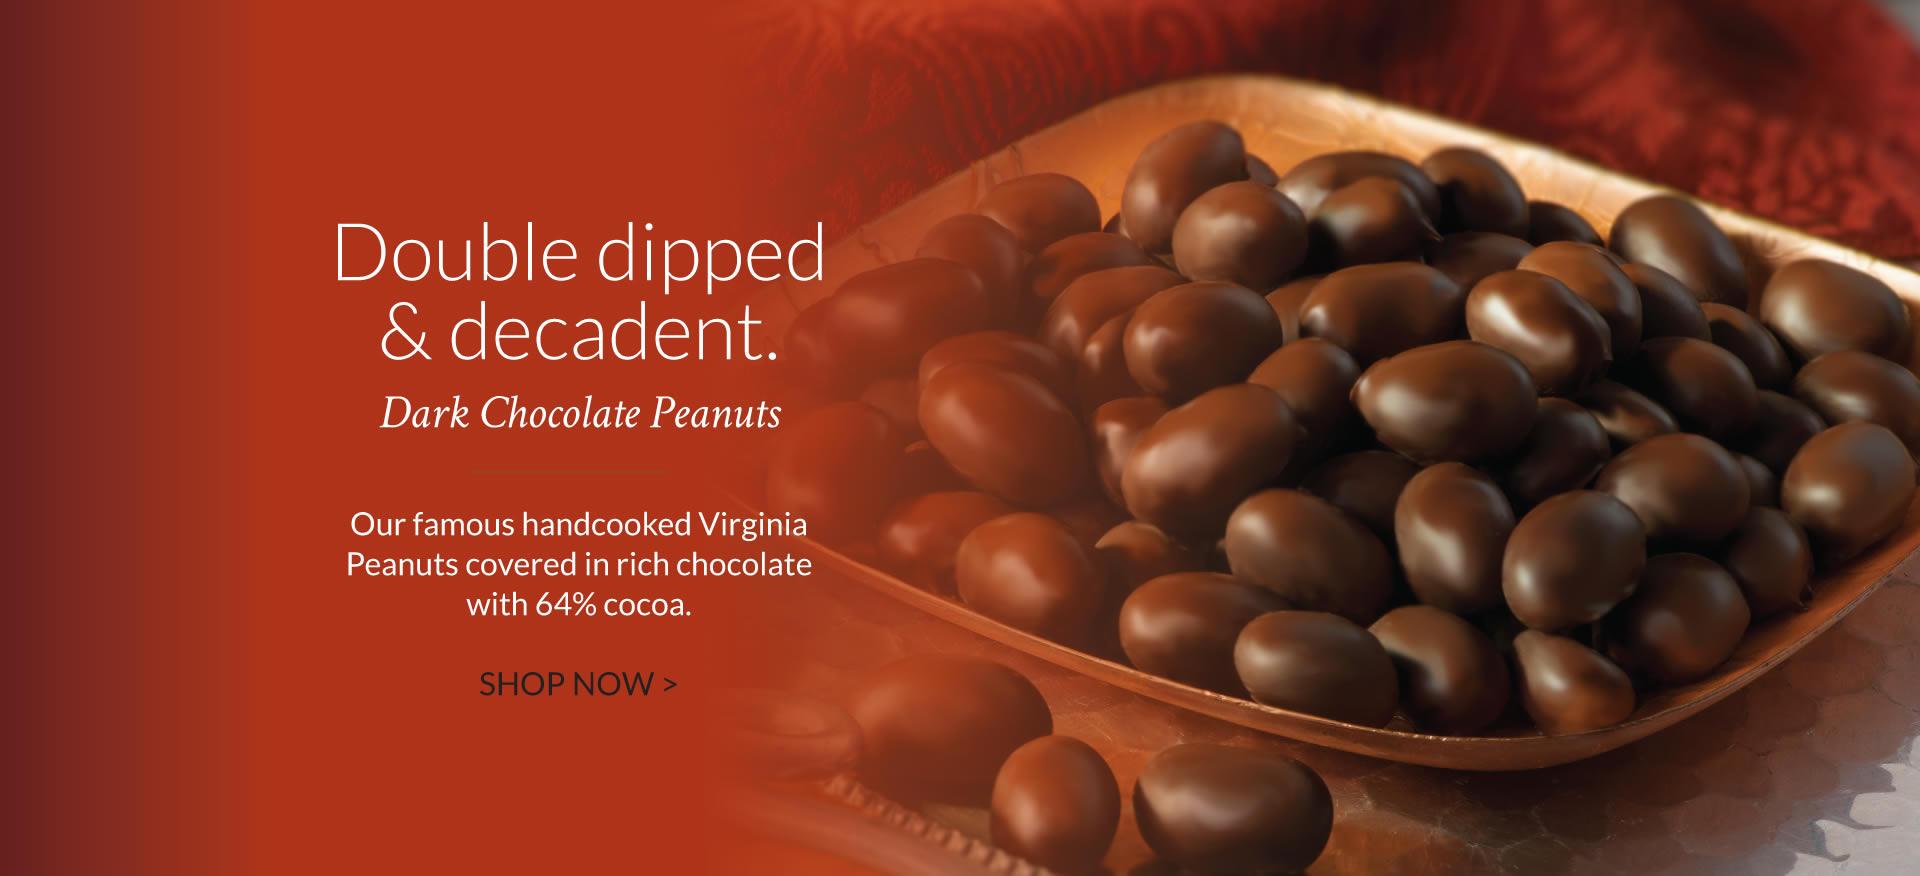 Dark Chocolate Virginia Peanuts